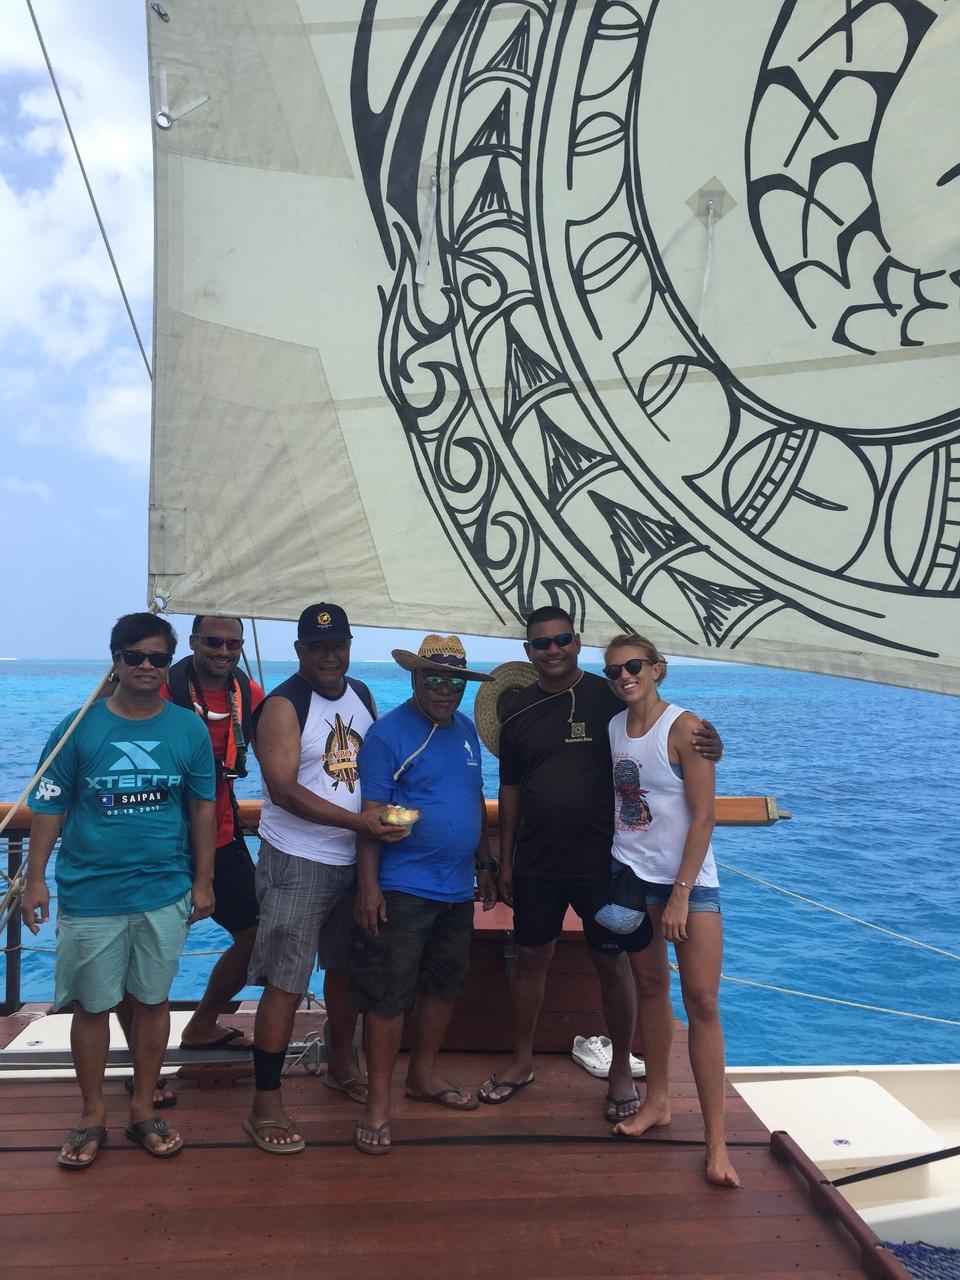 The Okeanos Marianas crew